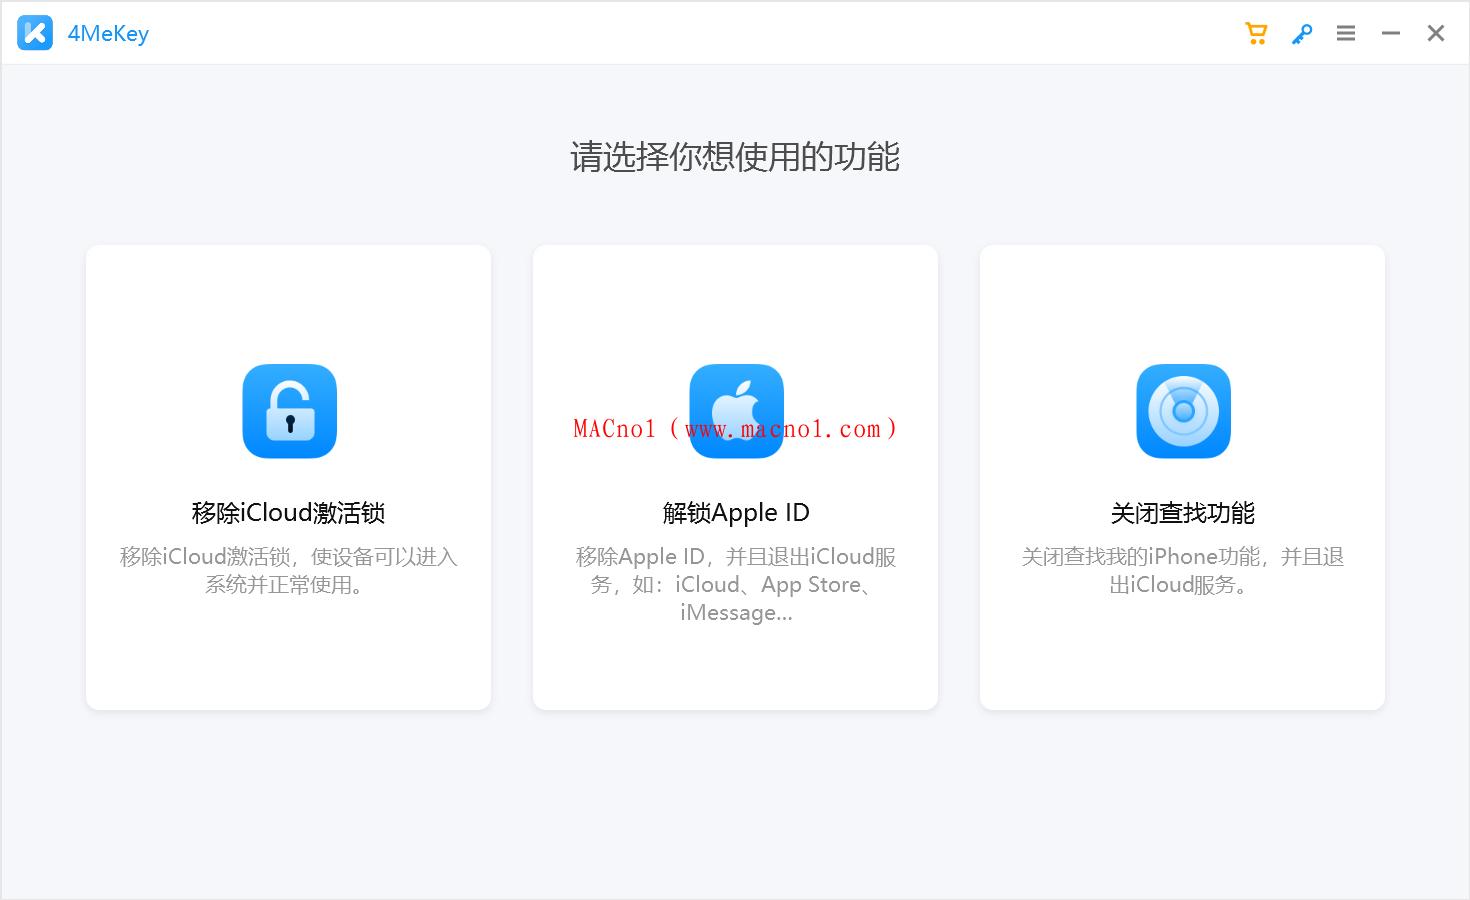 Tenorshare 4MeKey(密码管理工具)v3.0.4 中文破解版 附破解补丁